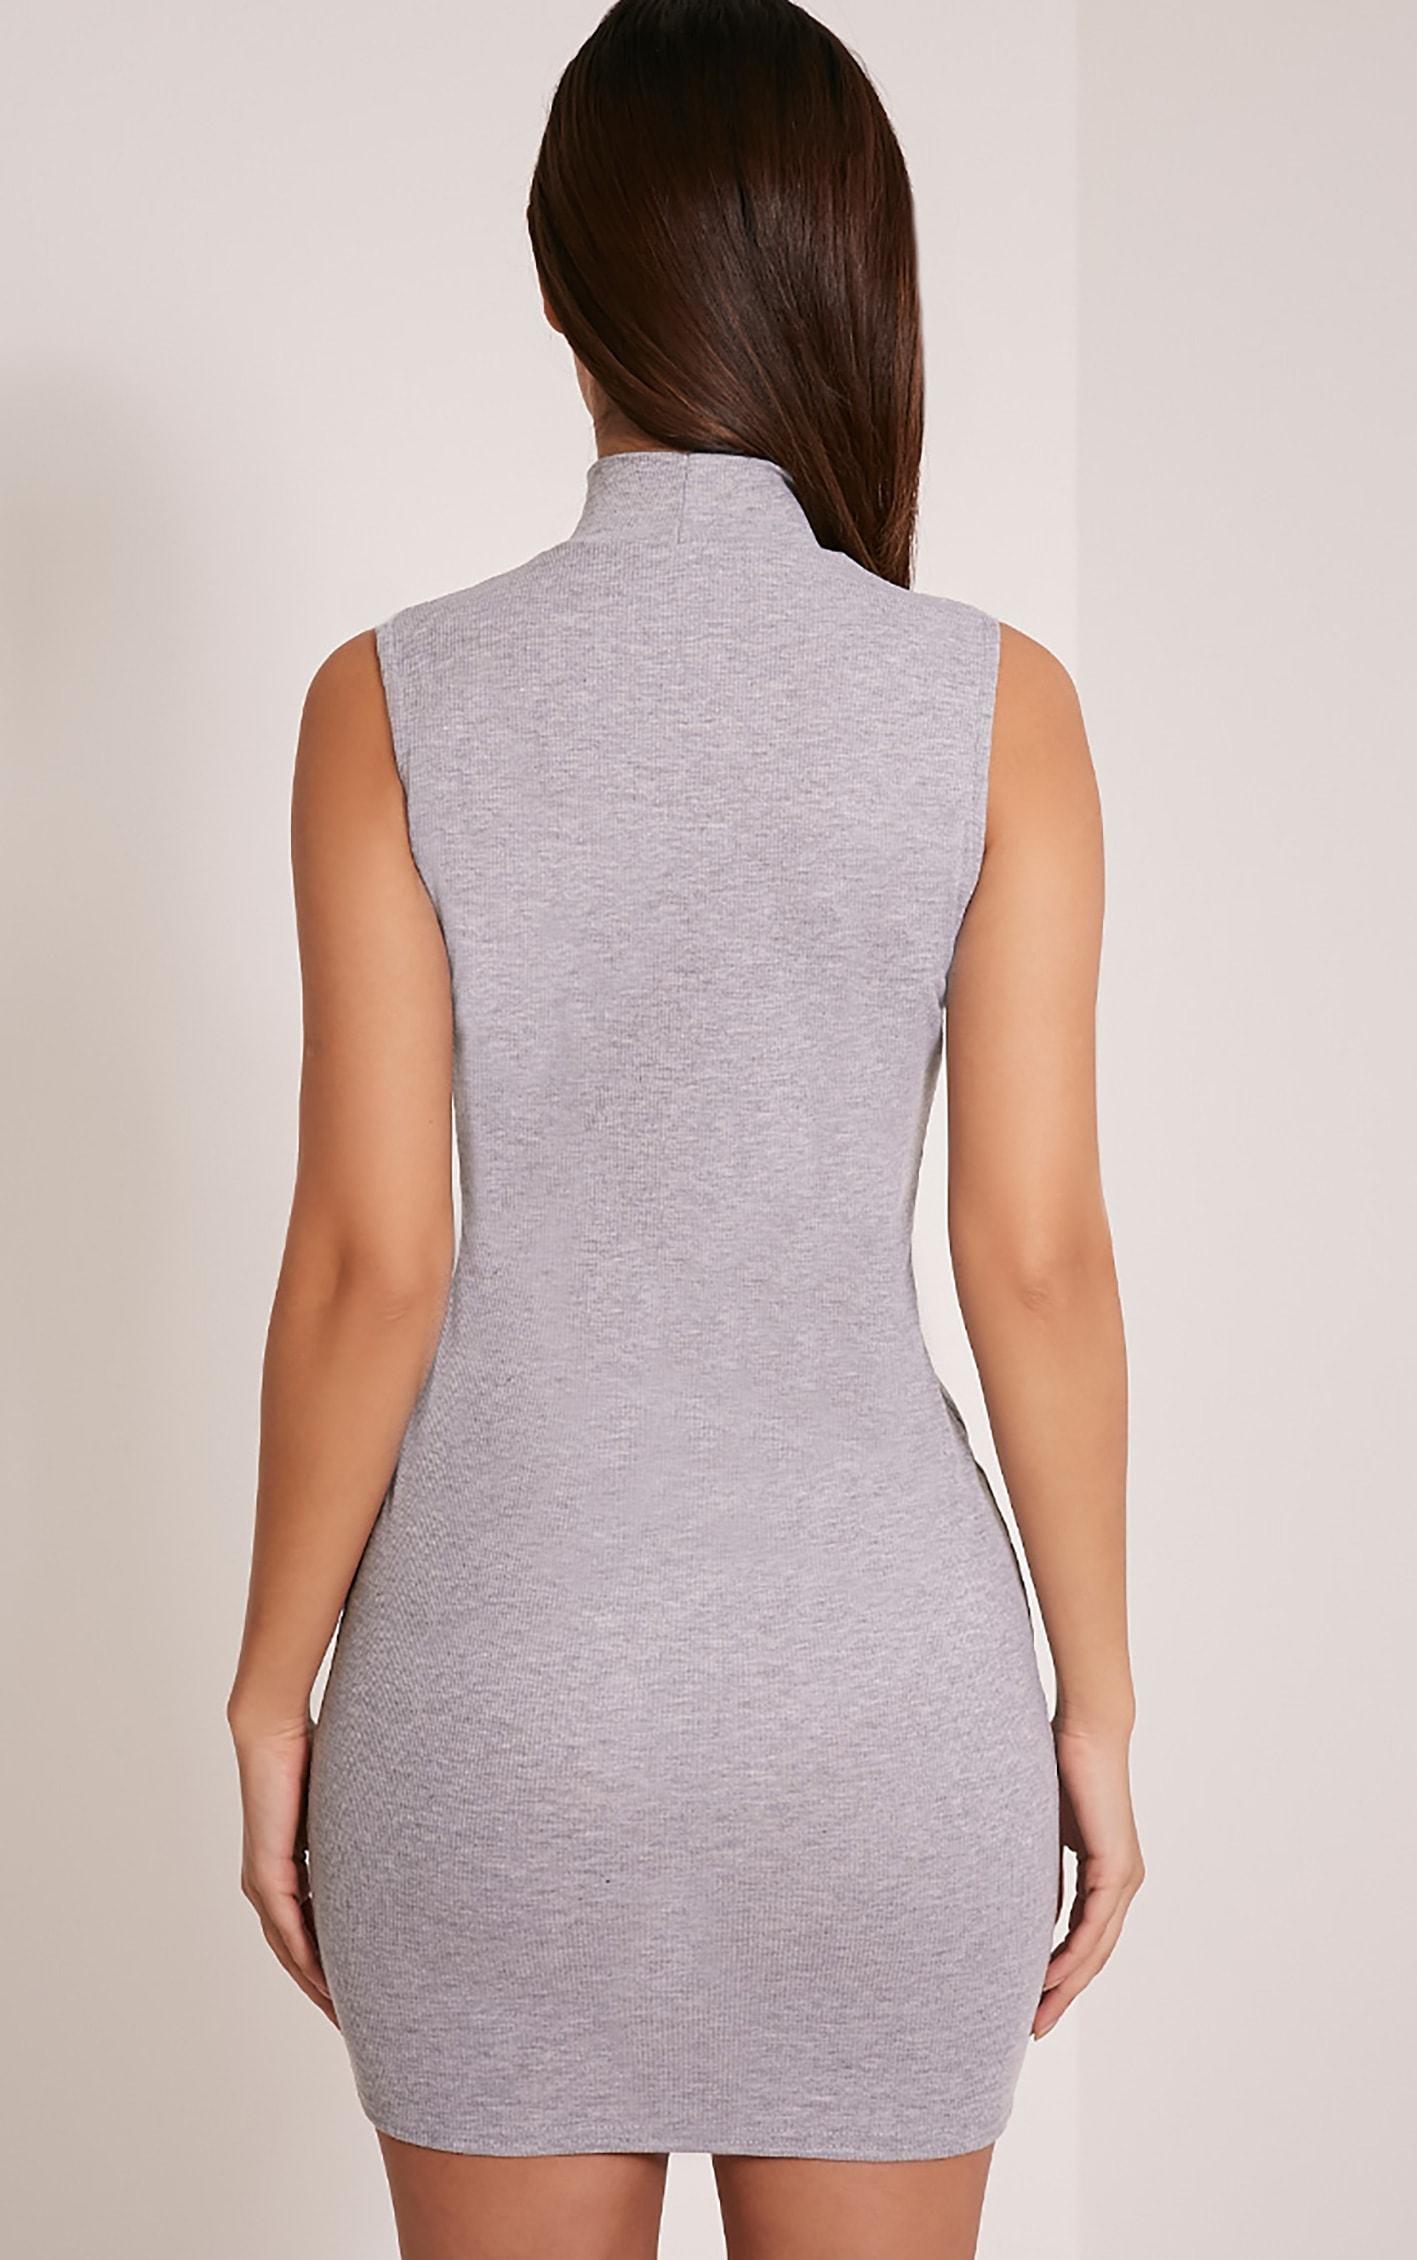 Marlene Grey Sleeveless Plain Zip Ribbed Bodycon Dress 2